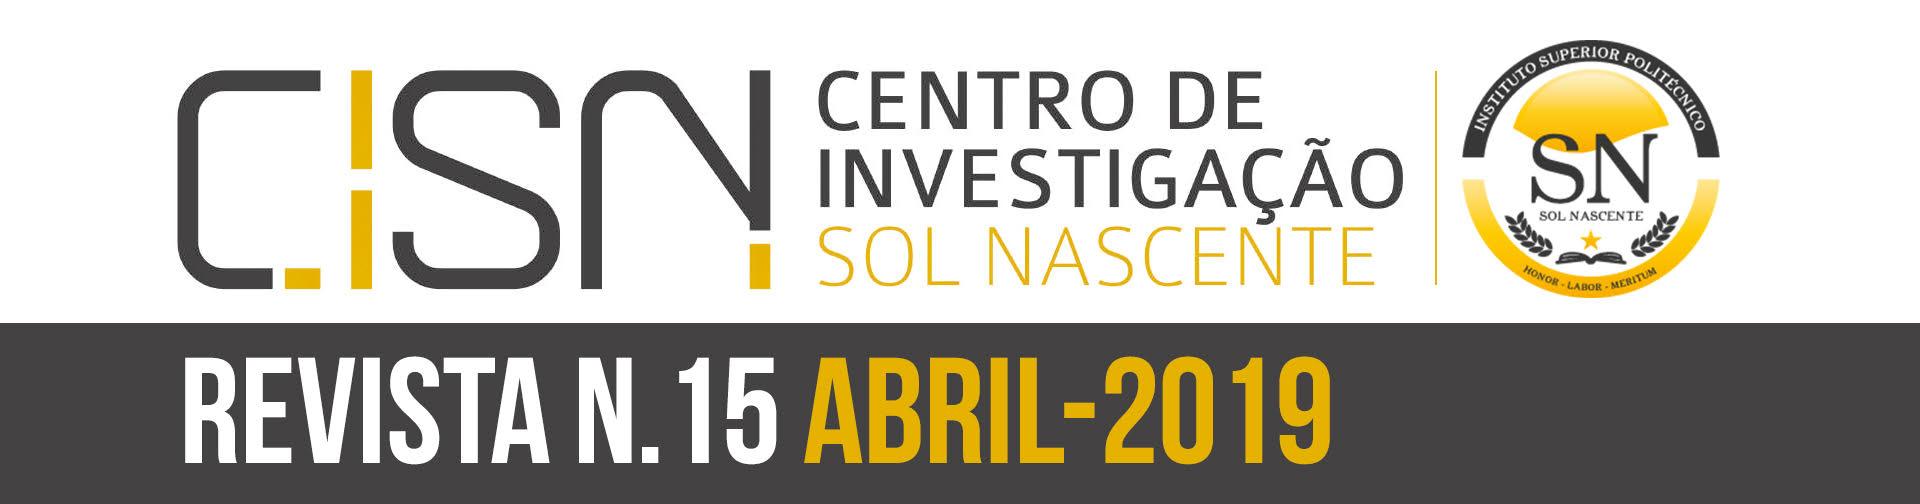 Revista Sol Nascente N. 15